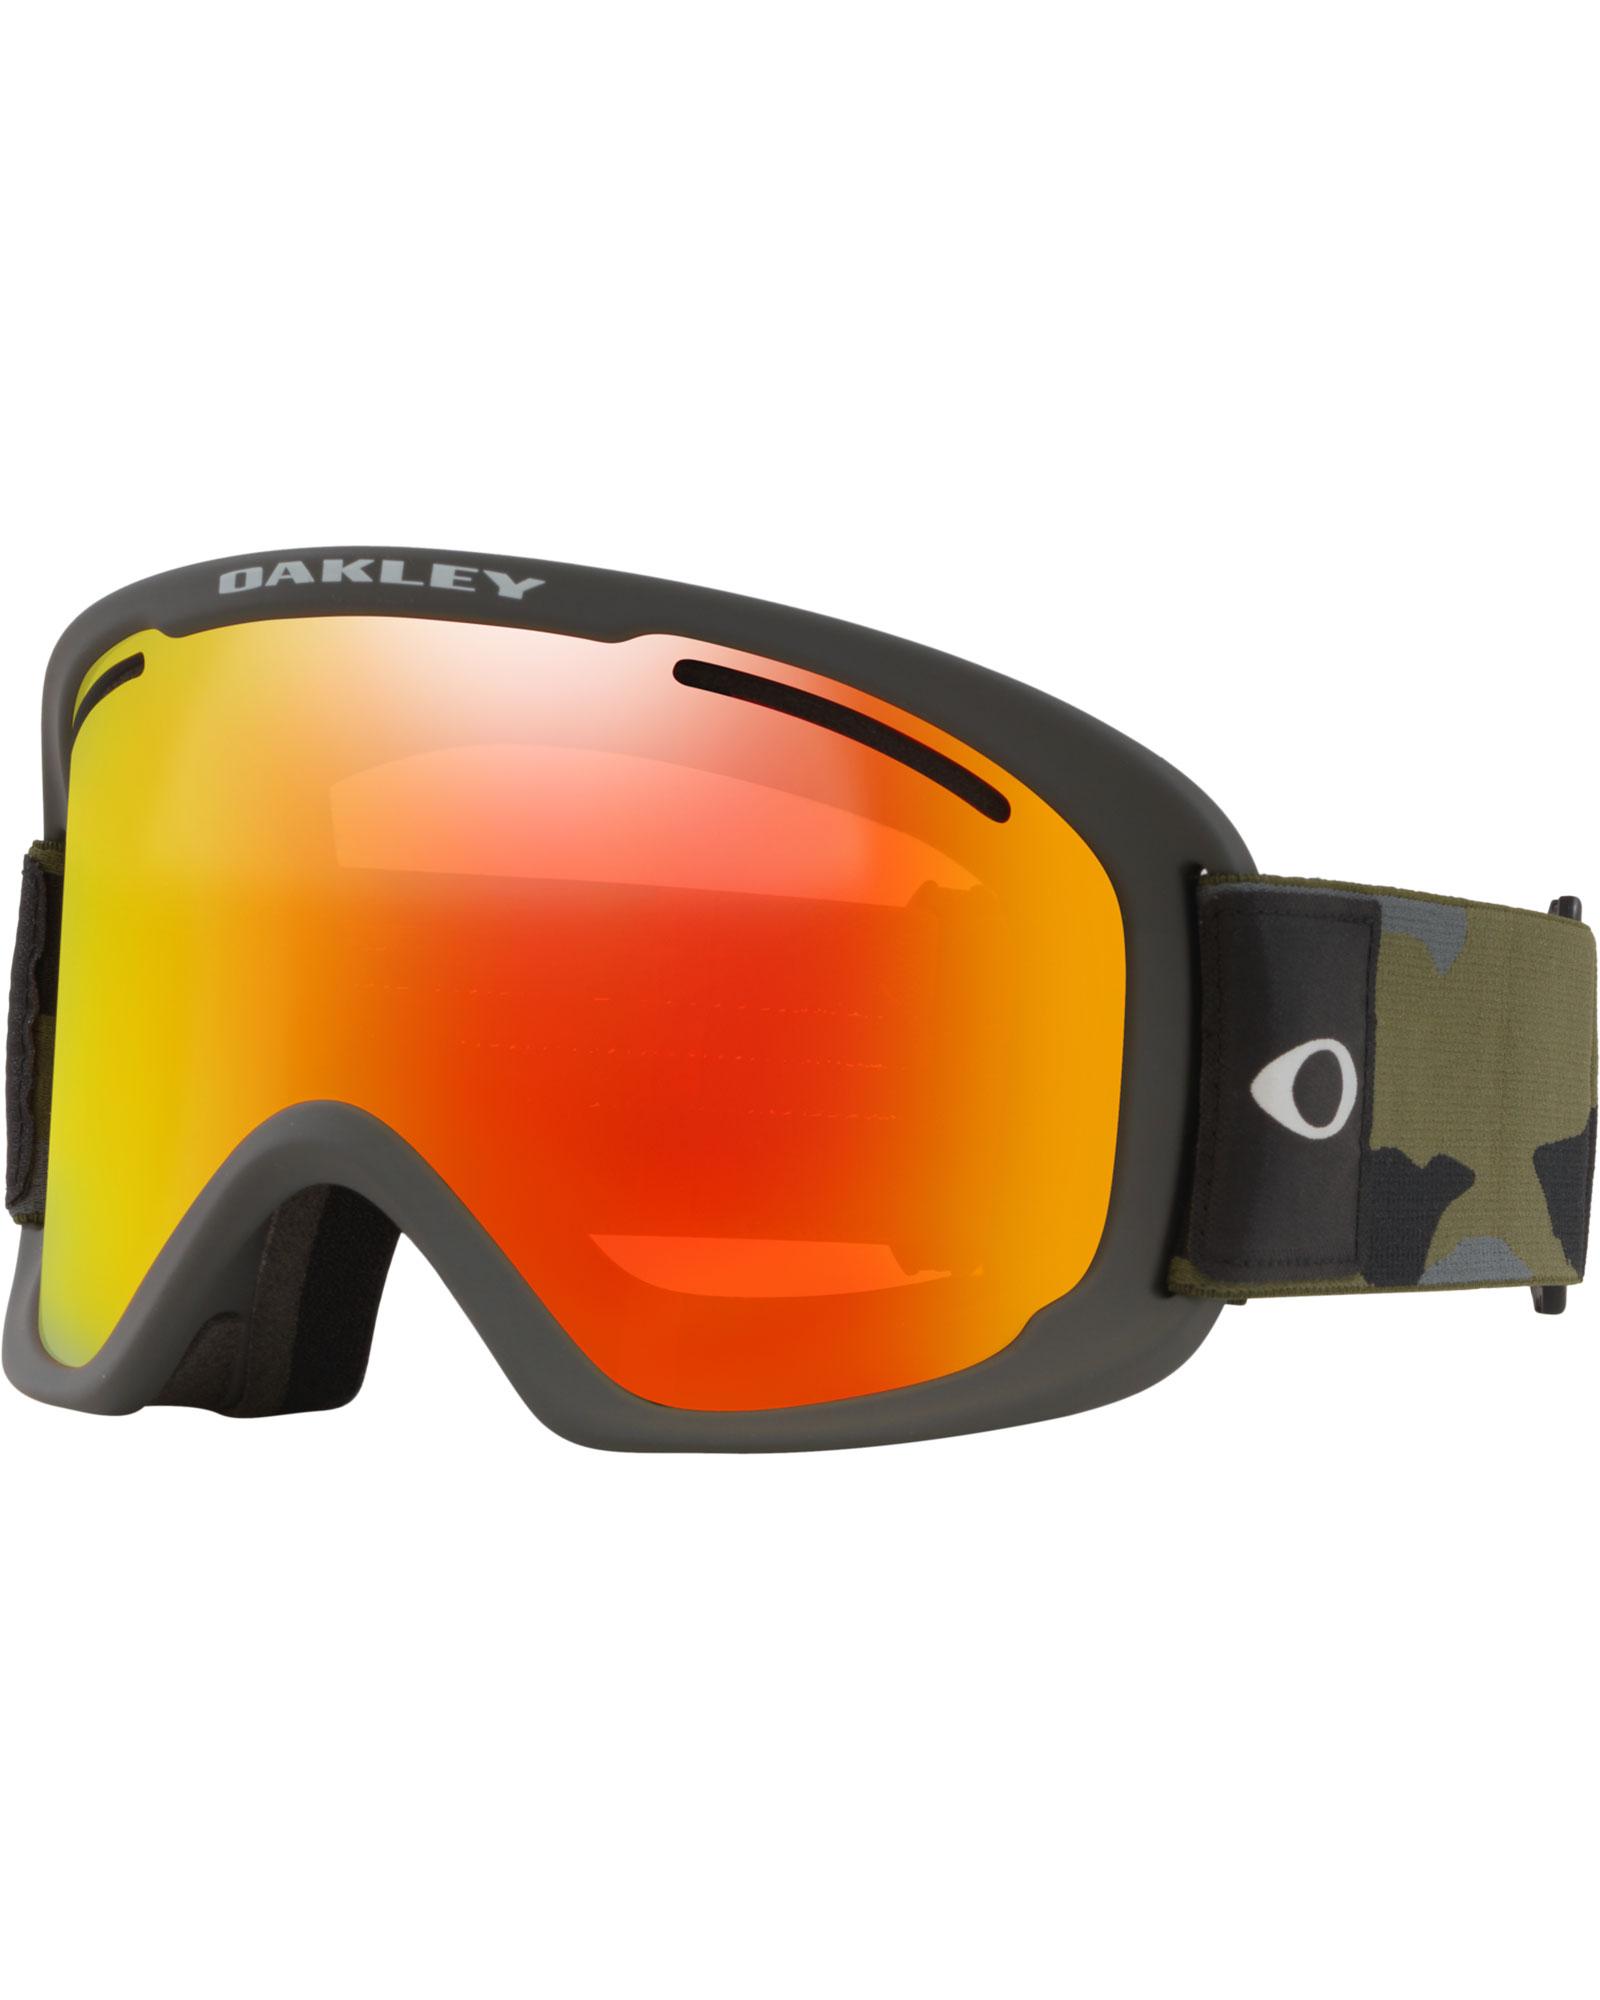 Oakley O Frame 2.0 Pro XL Dark Brush Camo / Fire Iridium + Persimmon Goggles 2020 / 2021 0